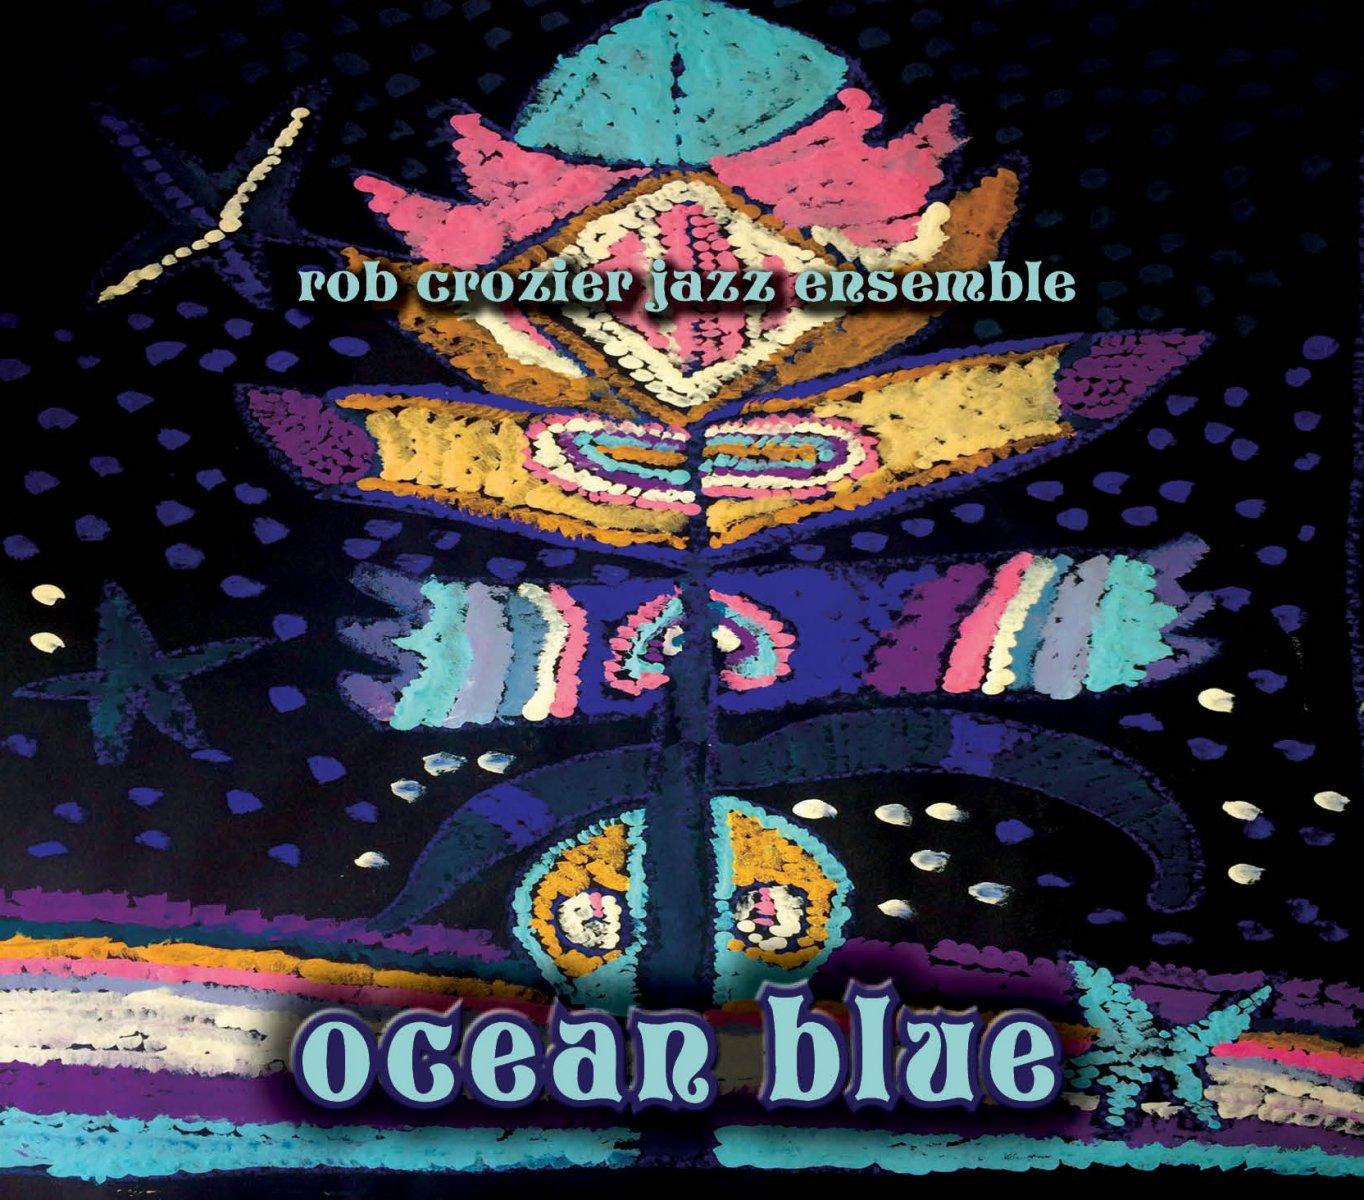 Rob CrozierOcwean Blue CD cover.jpg